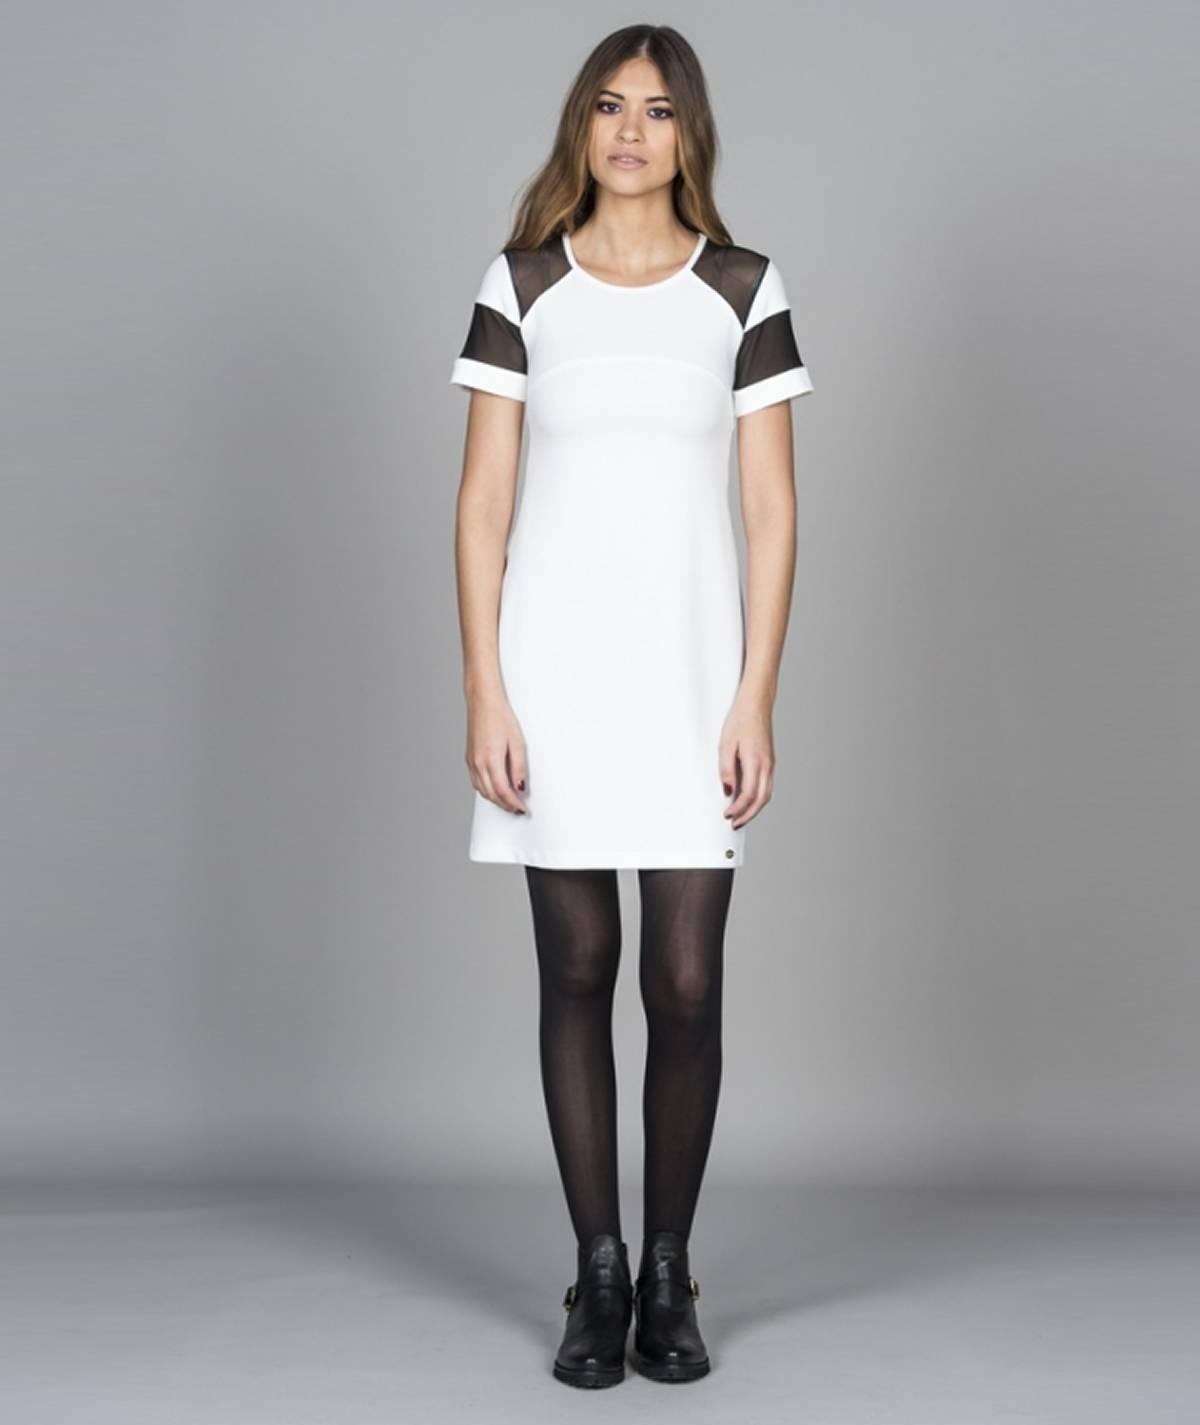 [CHIESSY] Vestido com...